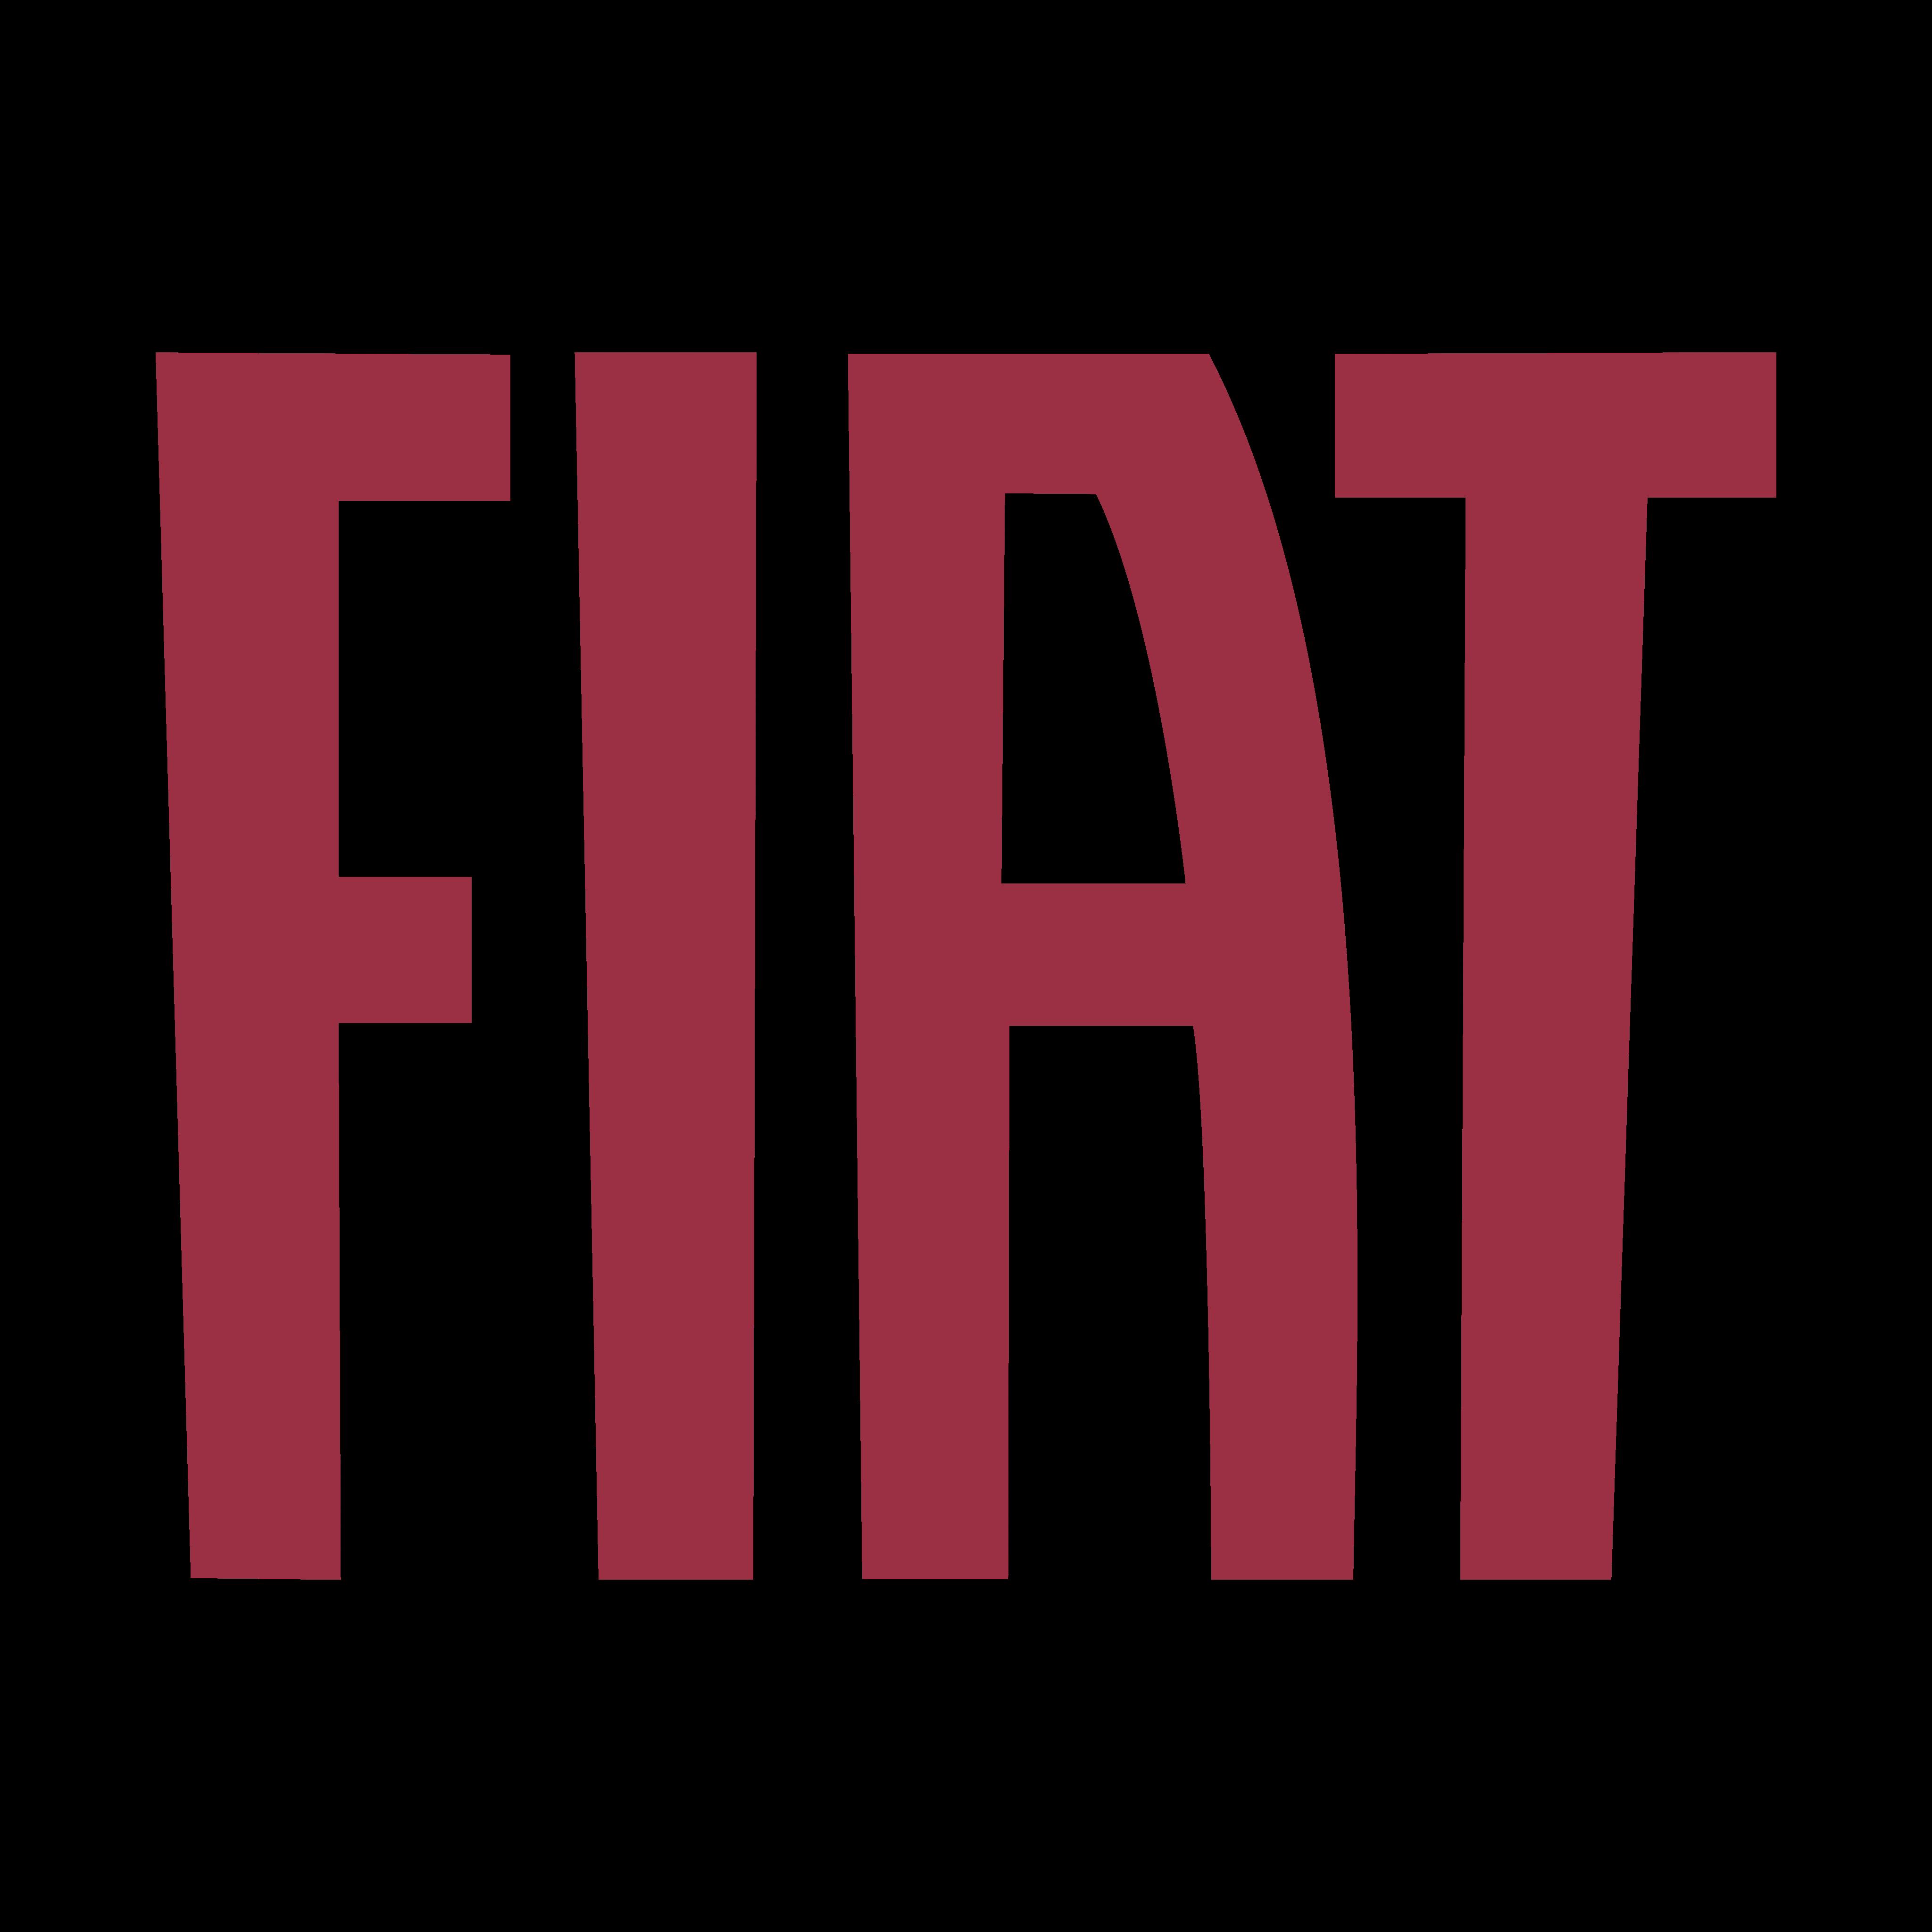 fiat logo 0 - FIAT Logo